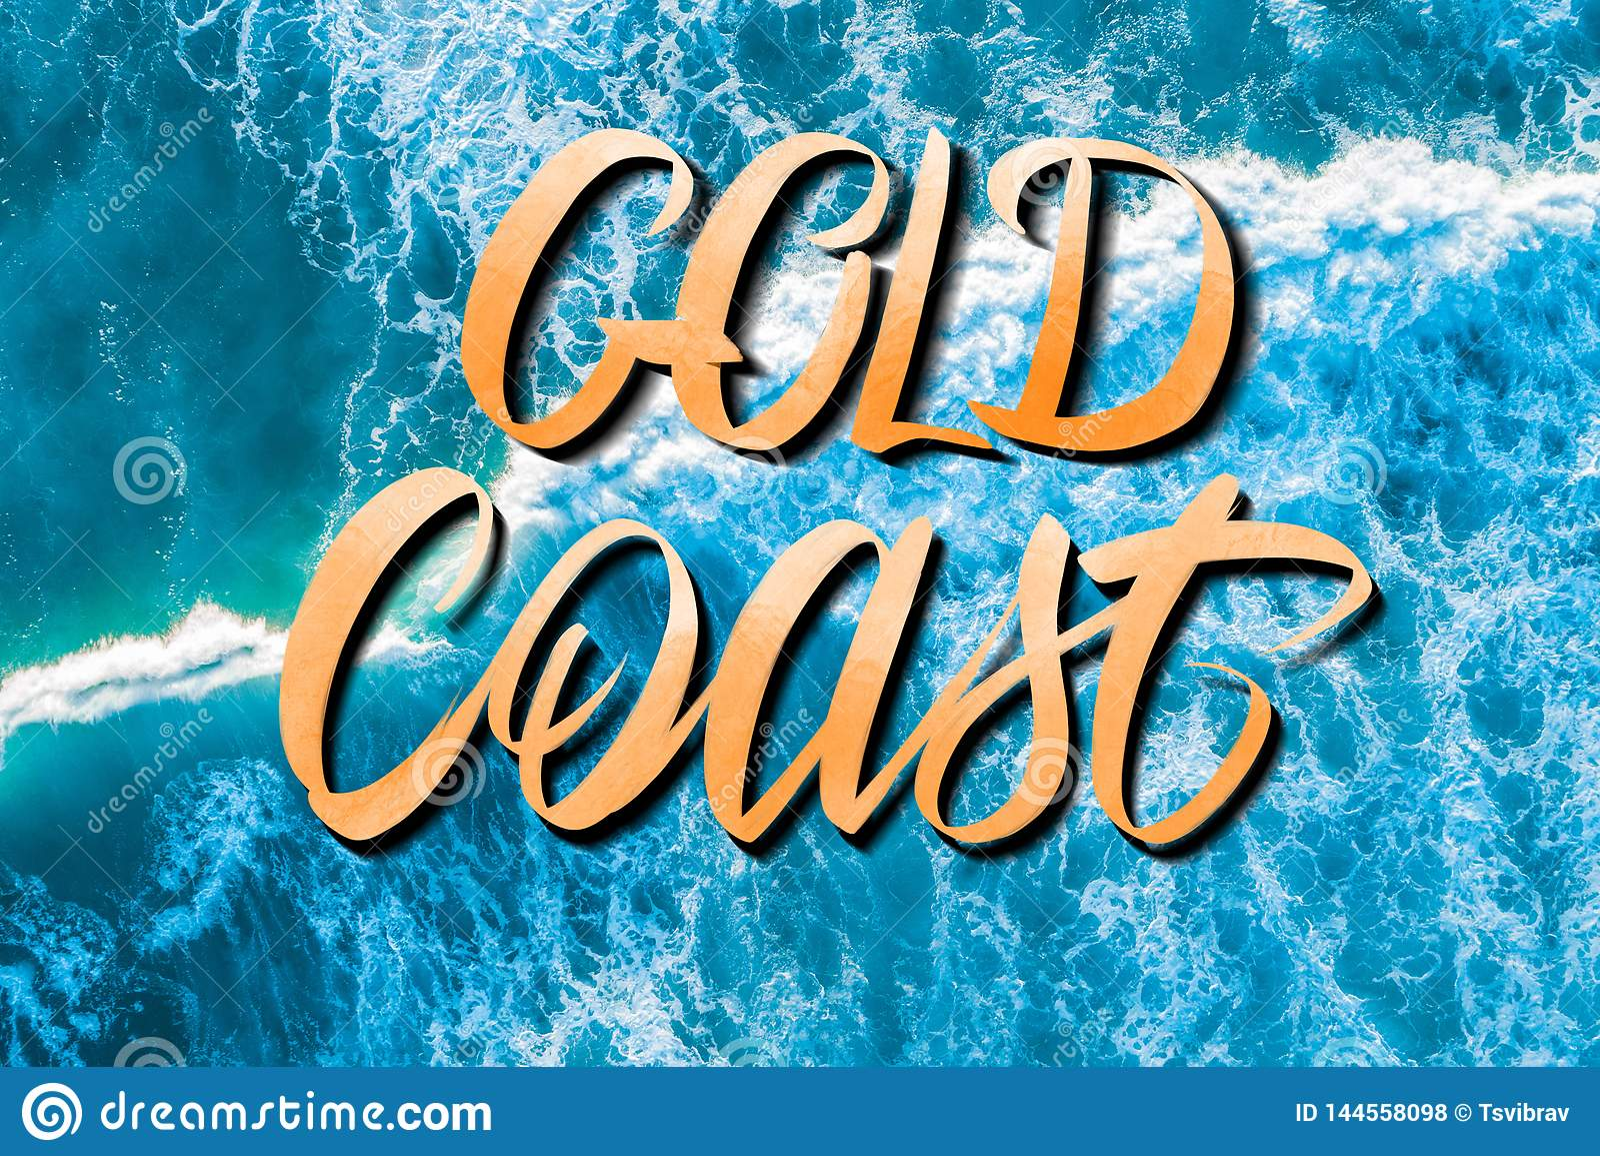 Gold Coast-Beschriftung über klaren blauen Zerquetschungswellen